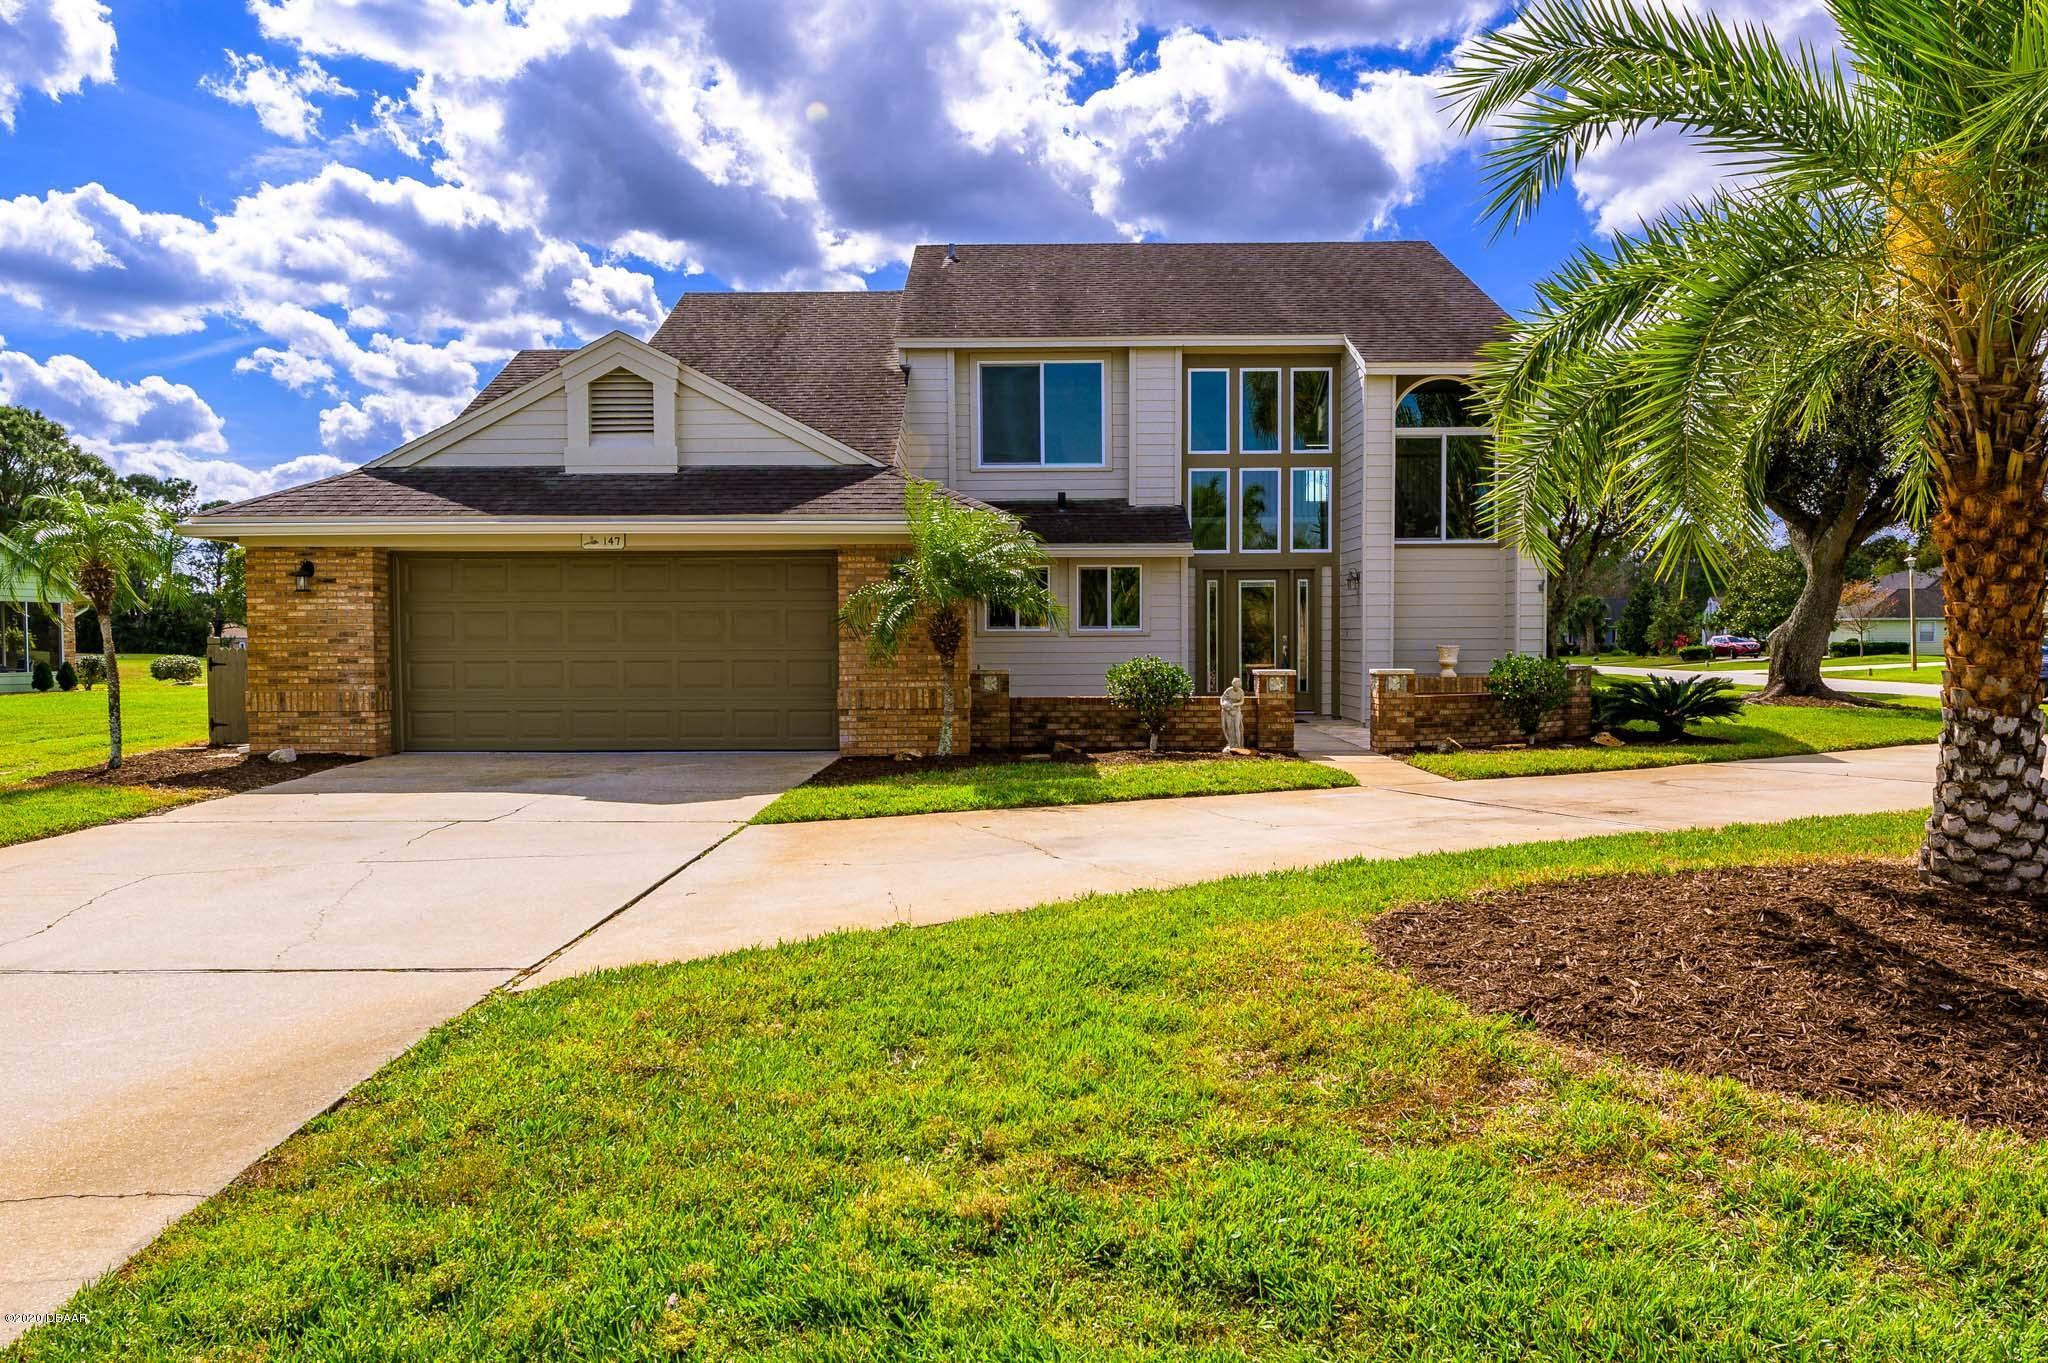 147 Green Heron Court, South Daytona, Florida